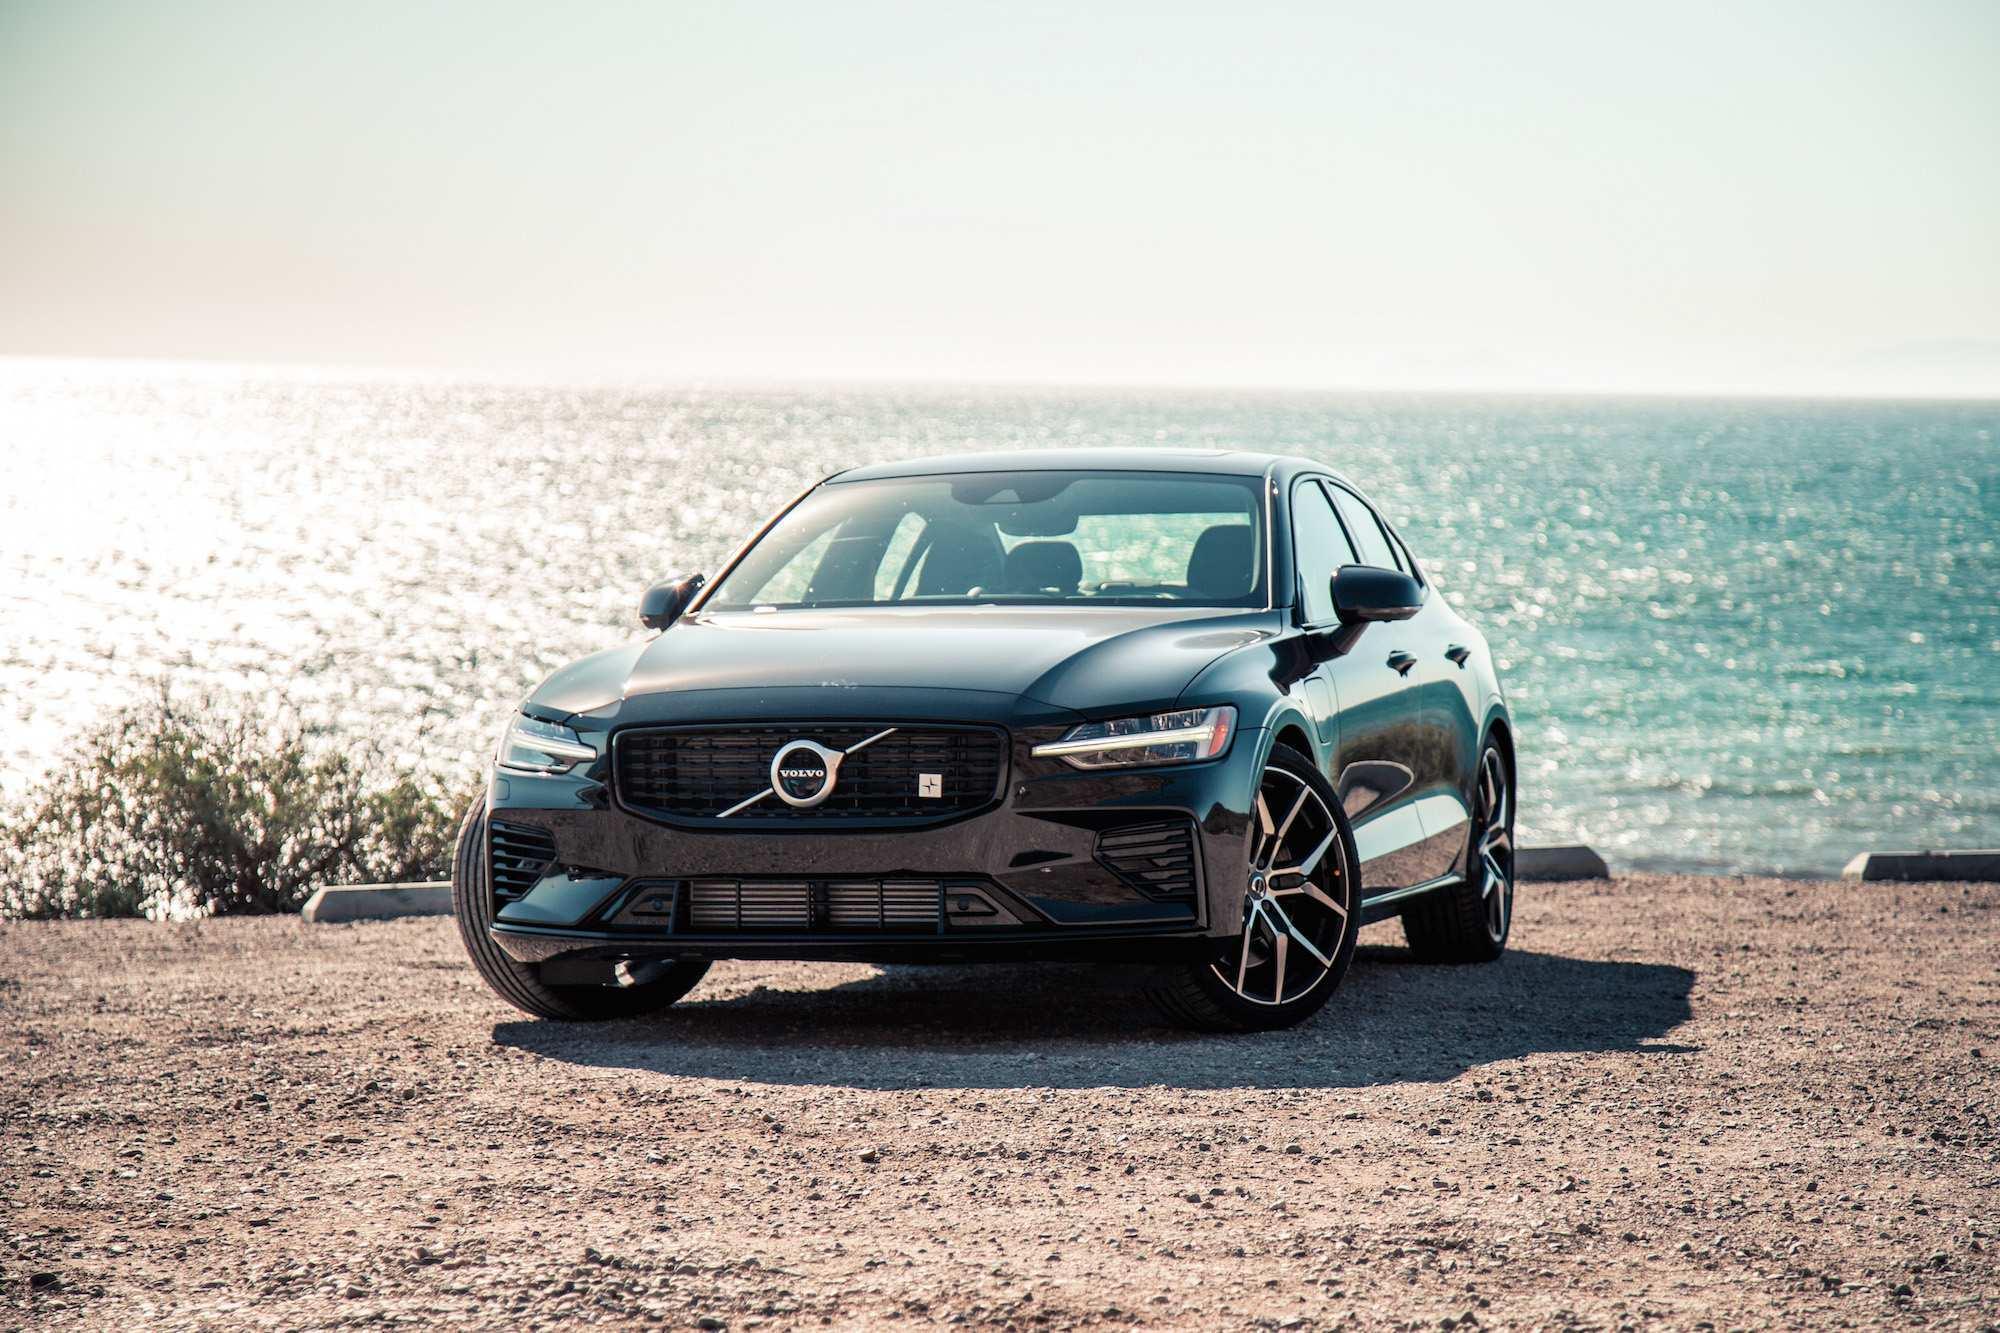 38 Best Review Polestar Volvo 2020 Rumors with Polestar Volvo 2020